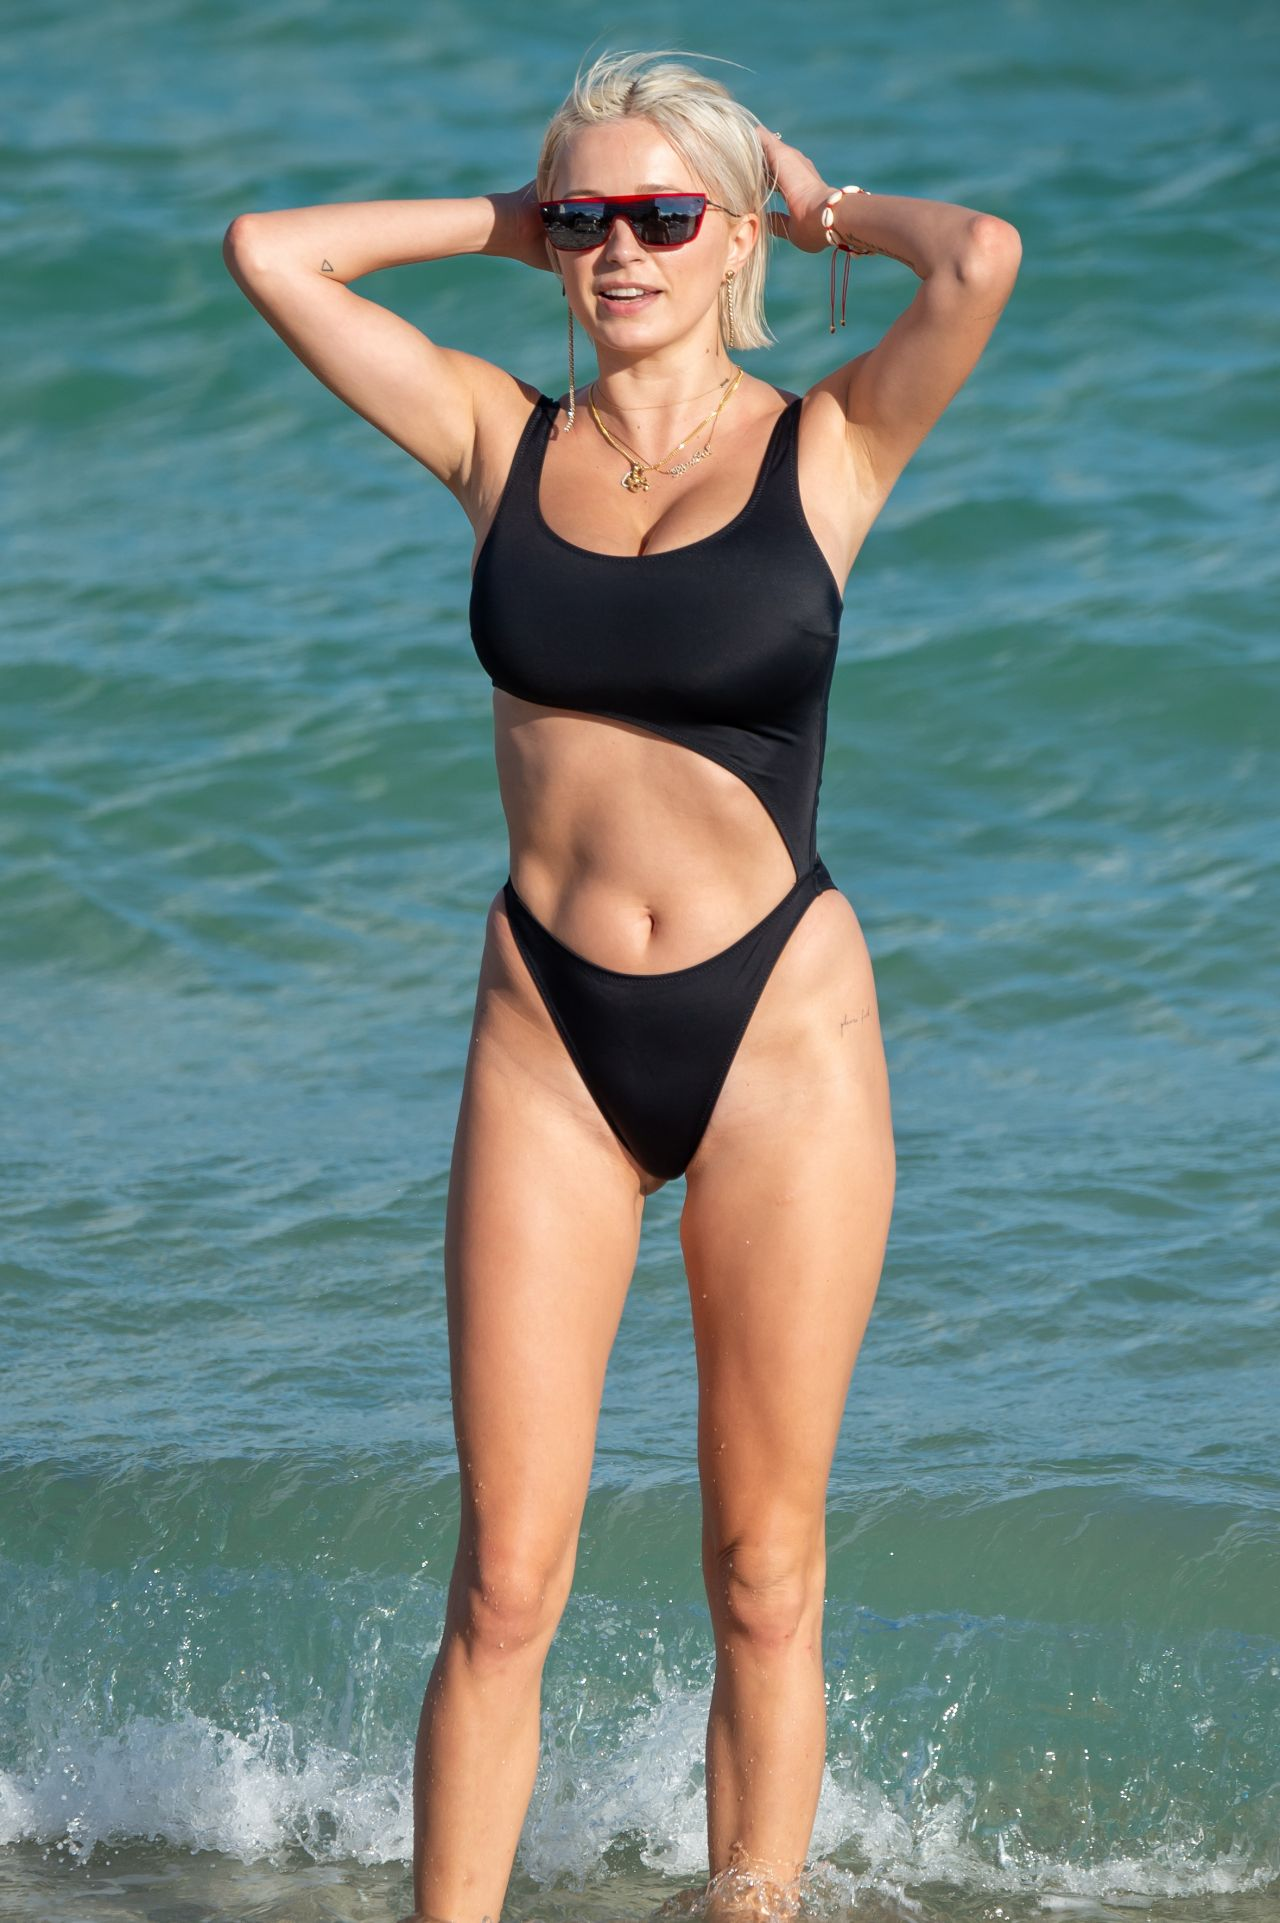 Paparazzi Caroline Vreeland naked (46 photos), Topless, Cleavage, Instagram, cleavage 2020